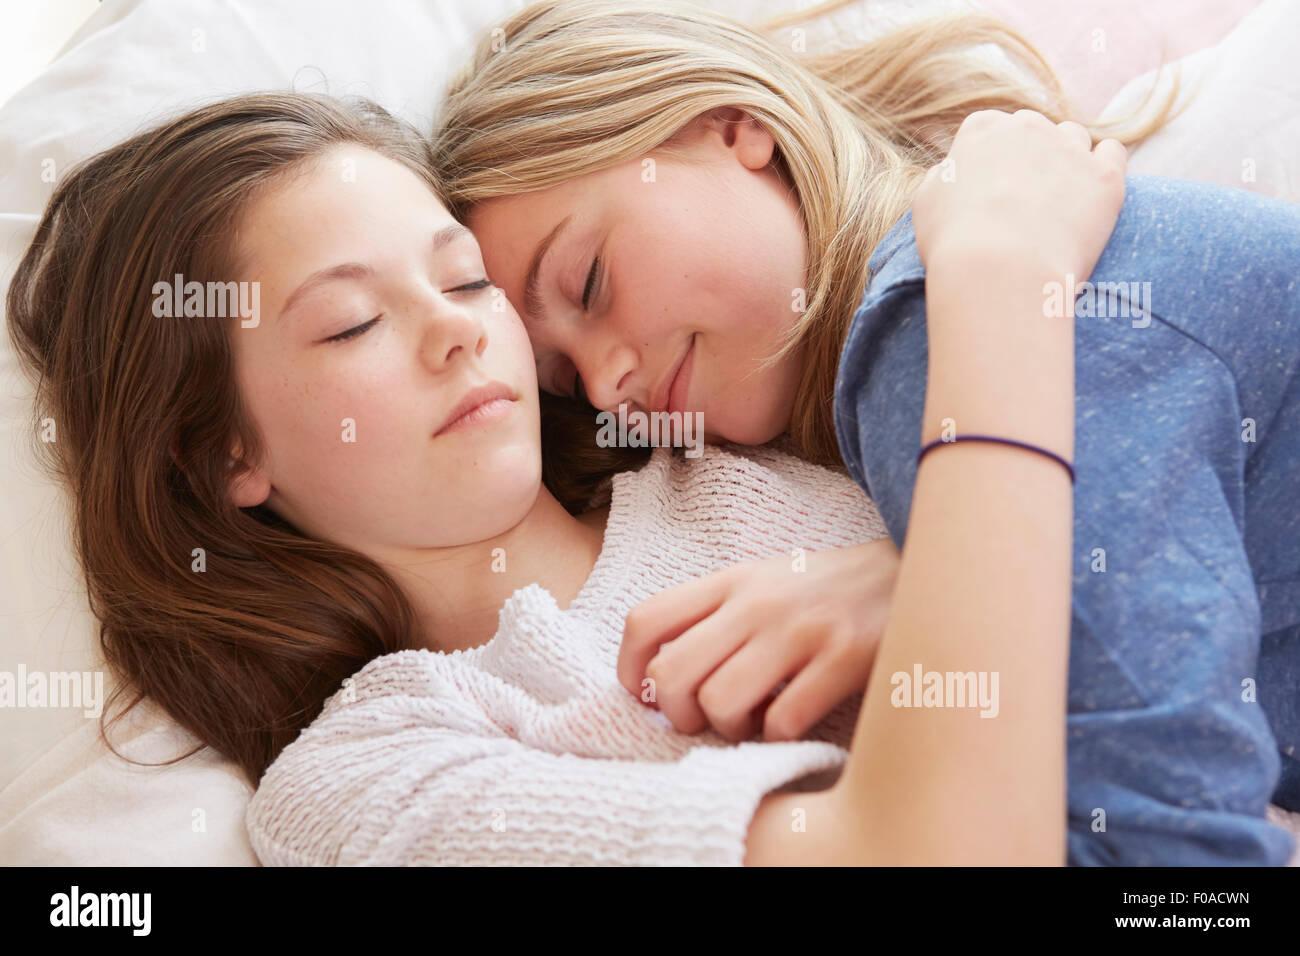 Zwei Mädchen auf dem Bett liegend mit Augen geschlossen Stockbild